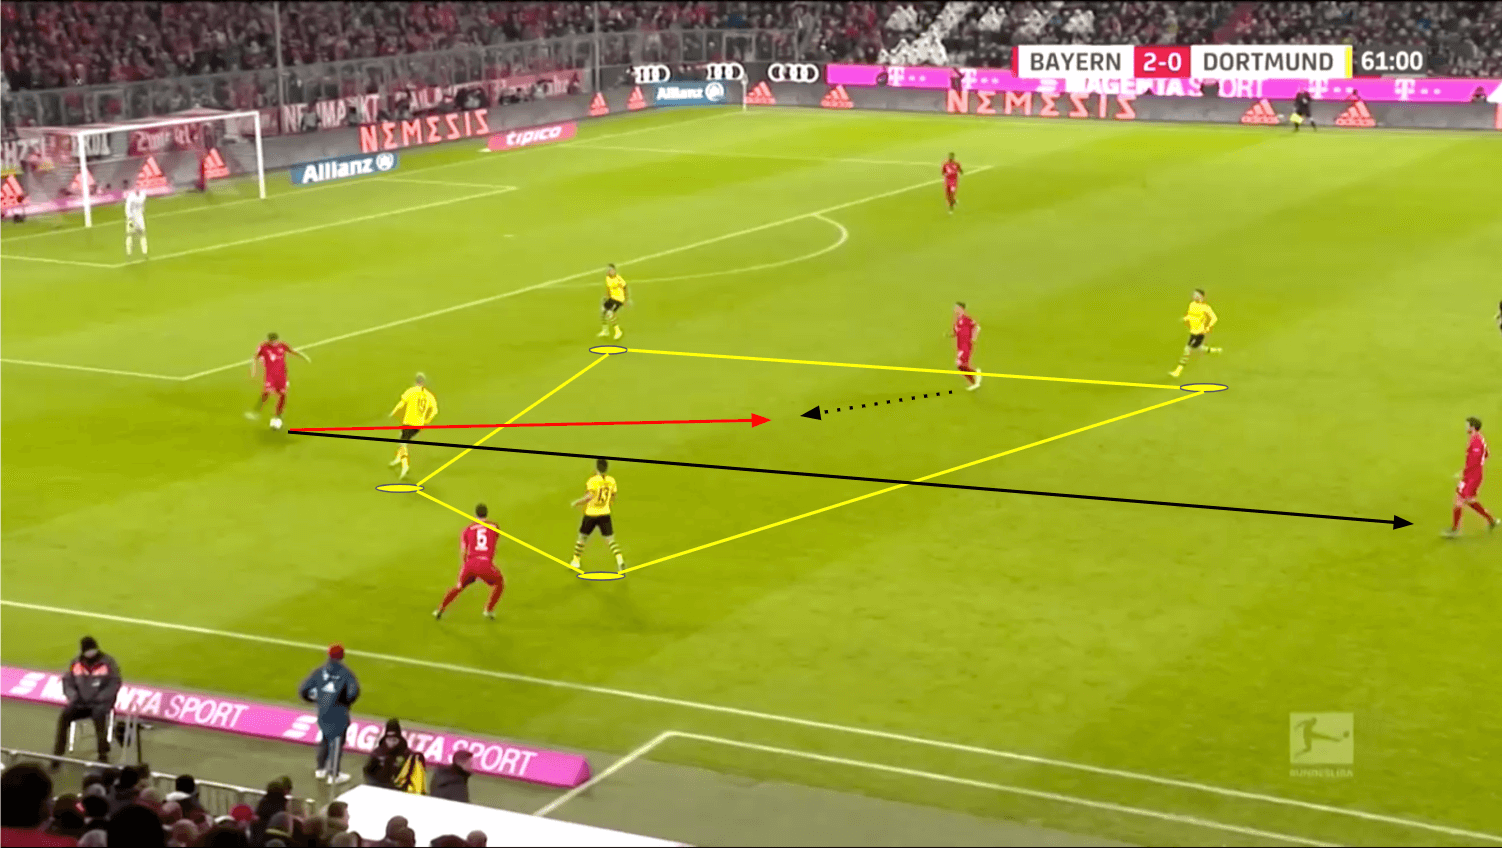 Javi Martínez 2019/20 - scout report - tactical analysis tactics